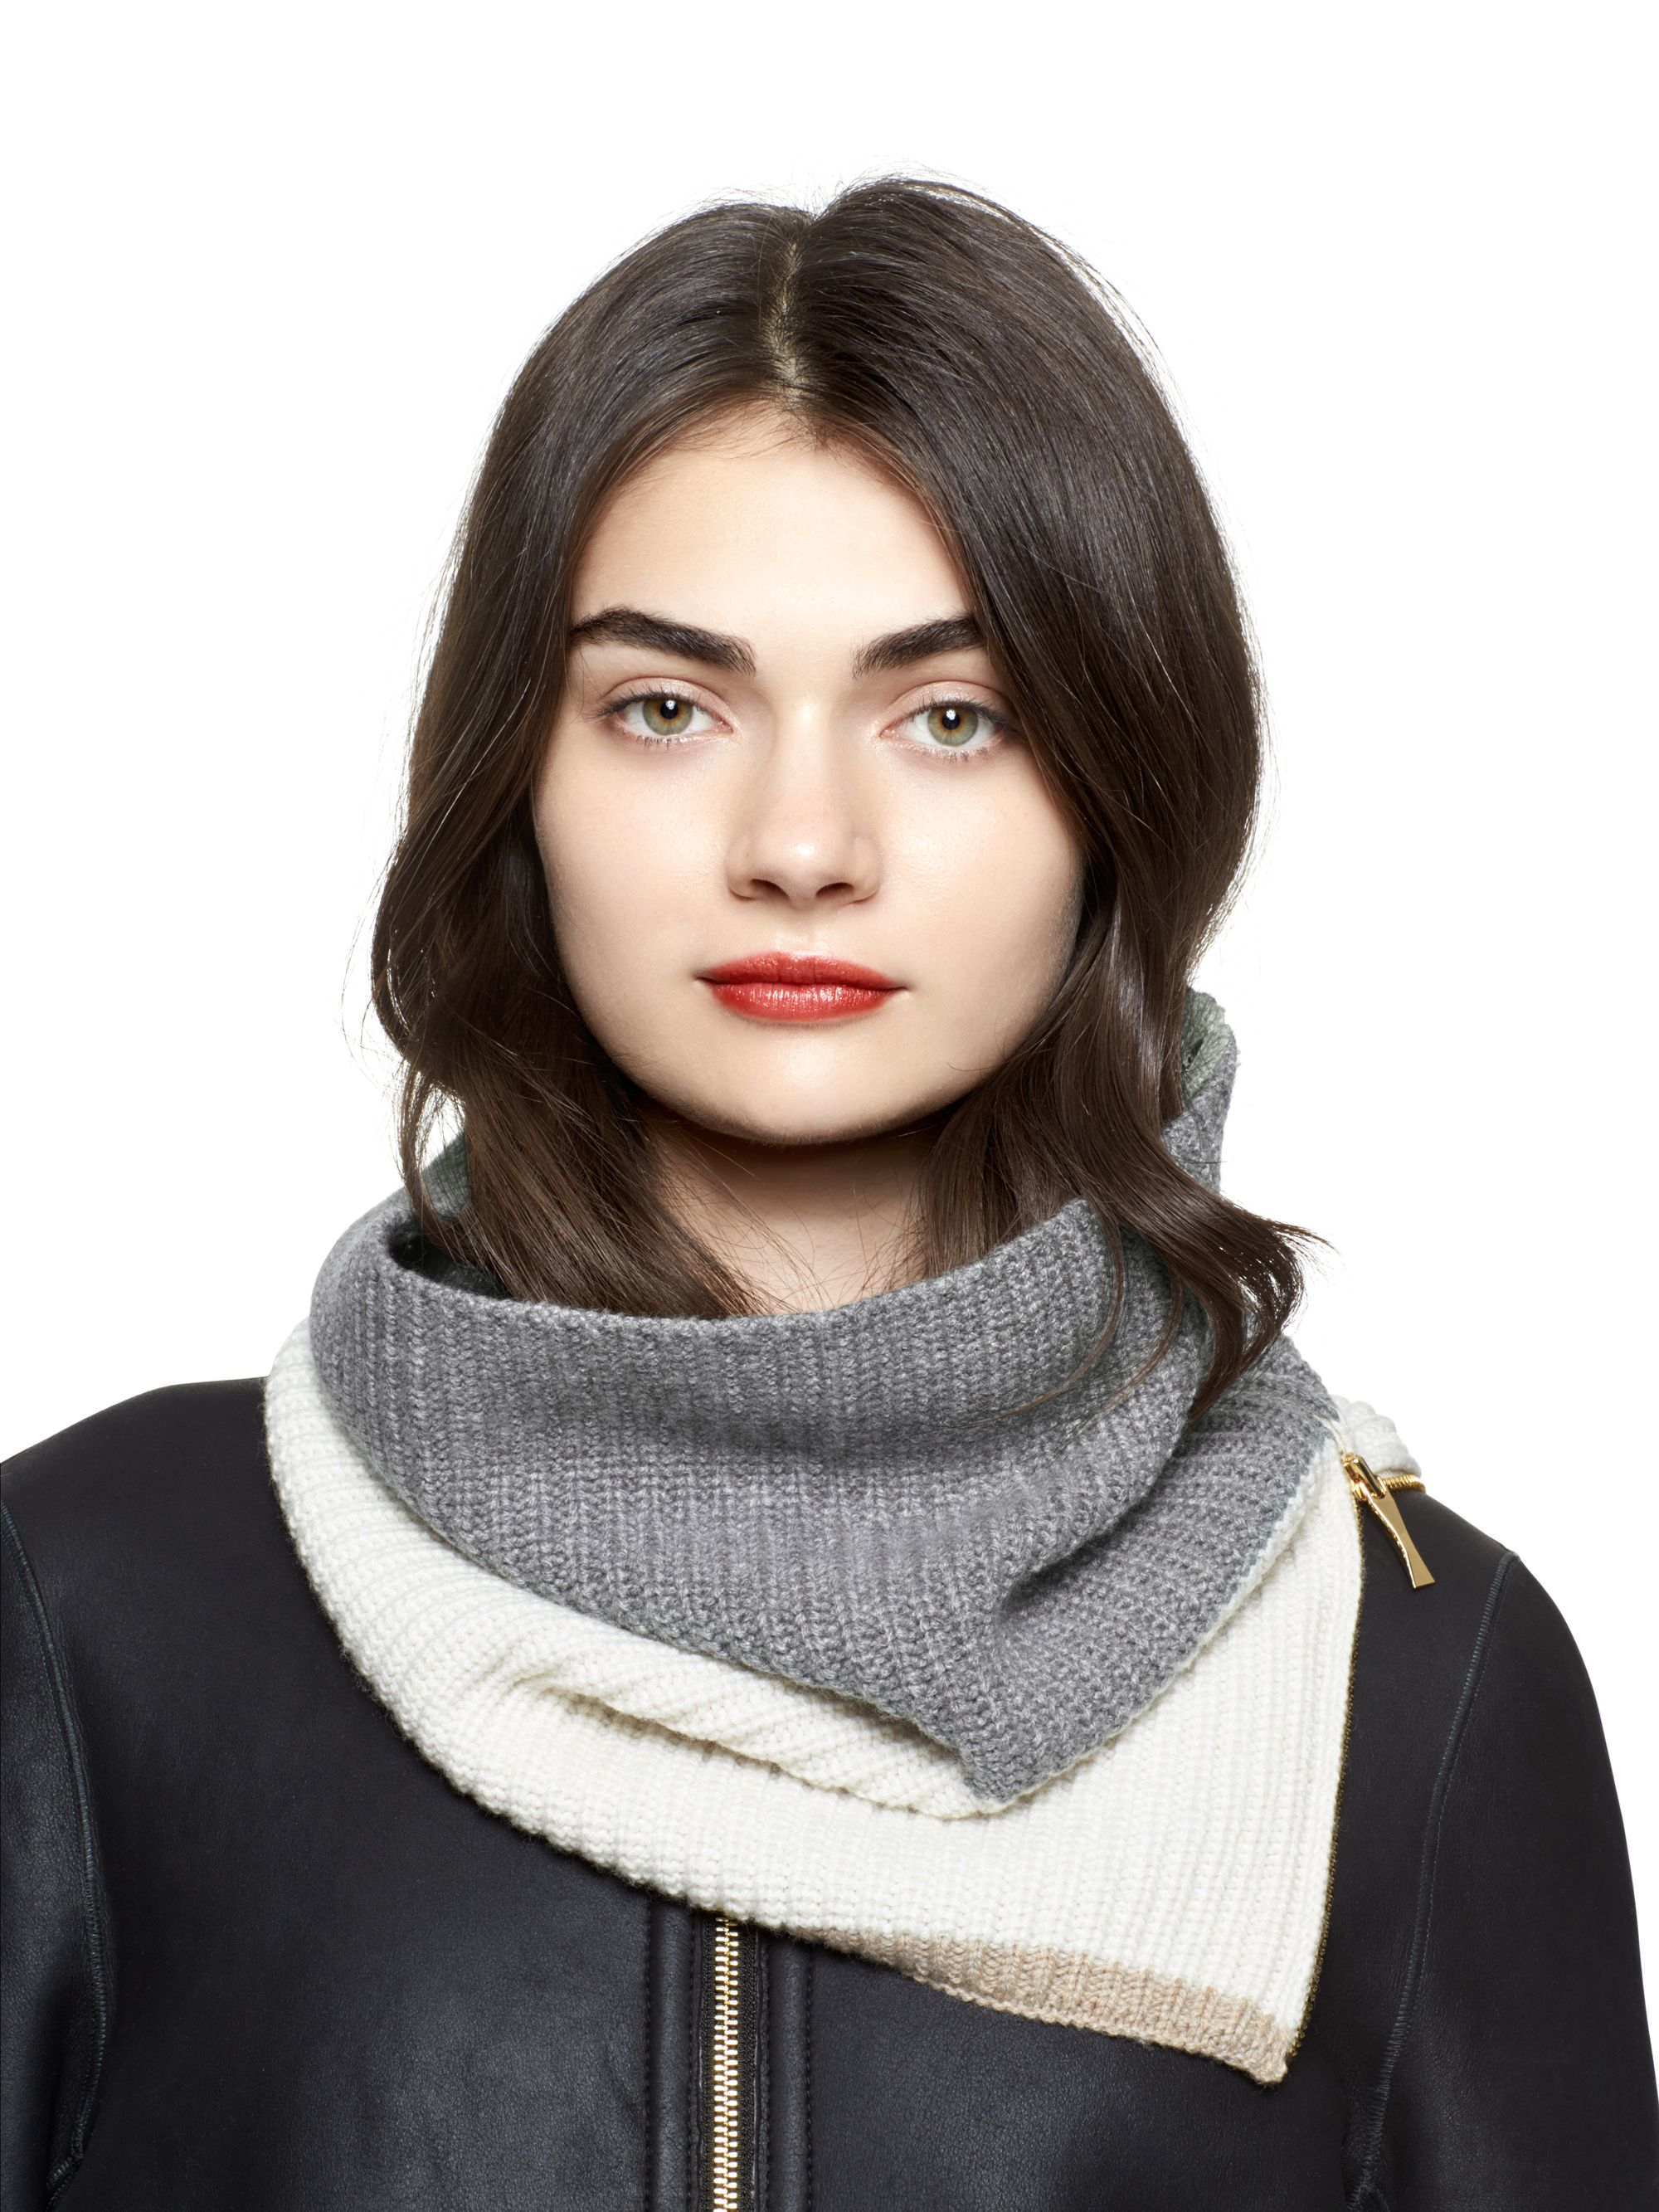 Lyst Kate Spade New York Zip Up Neckwarmer in Gray